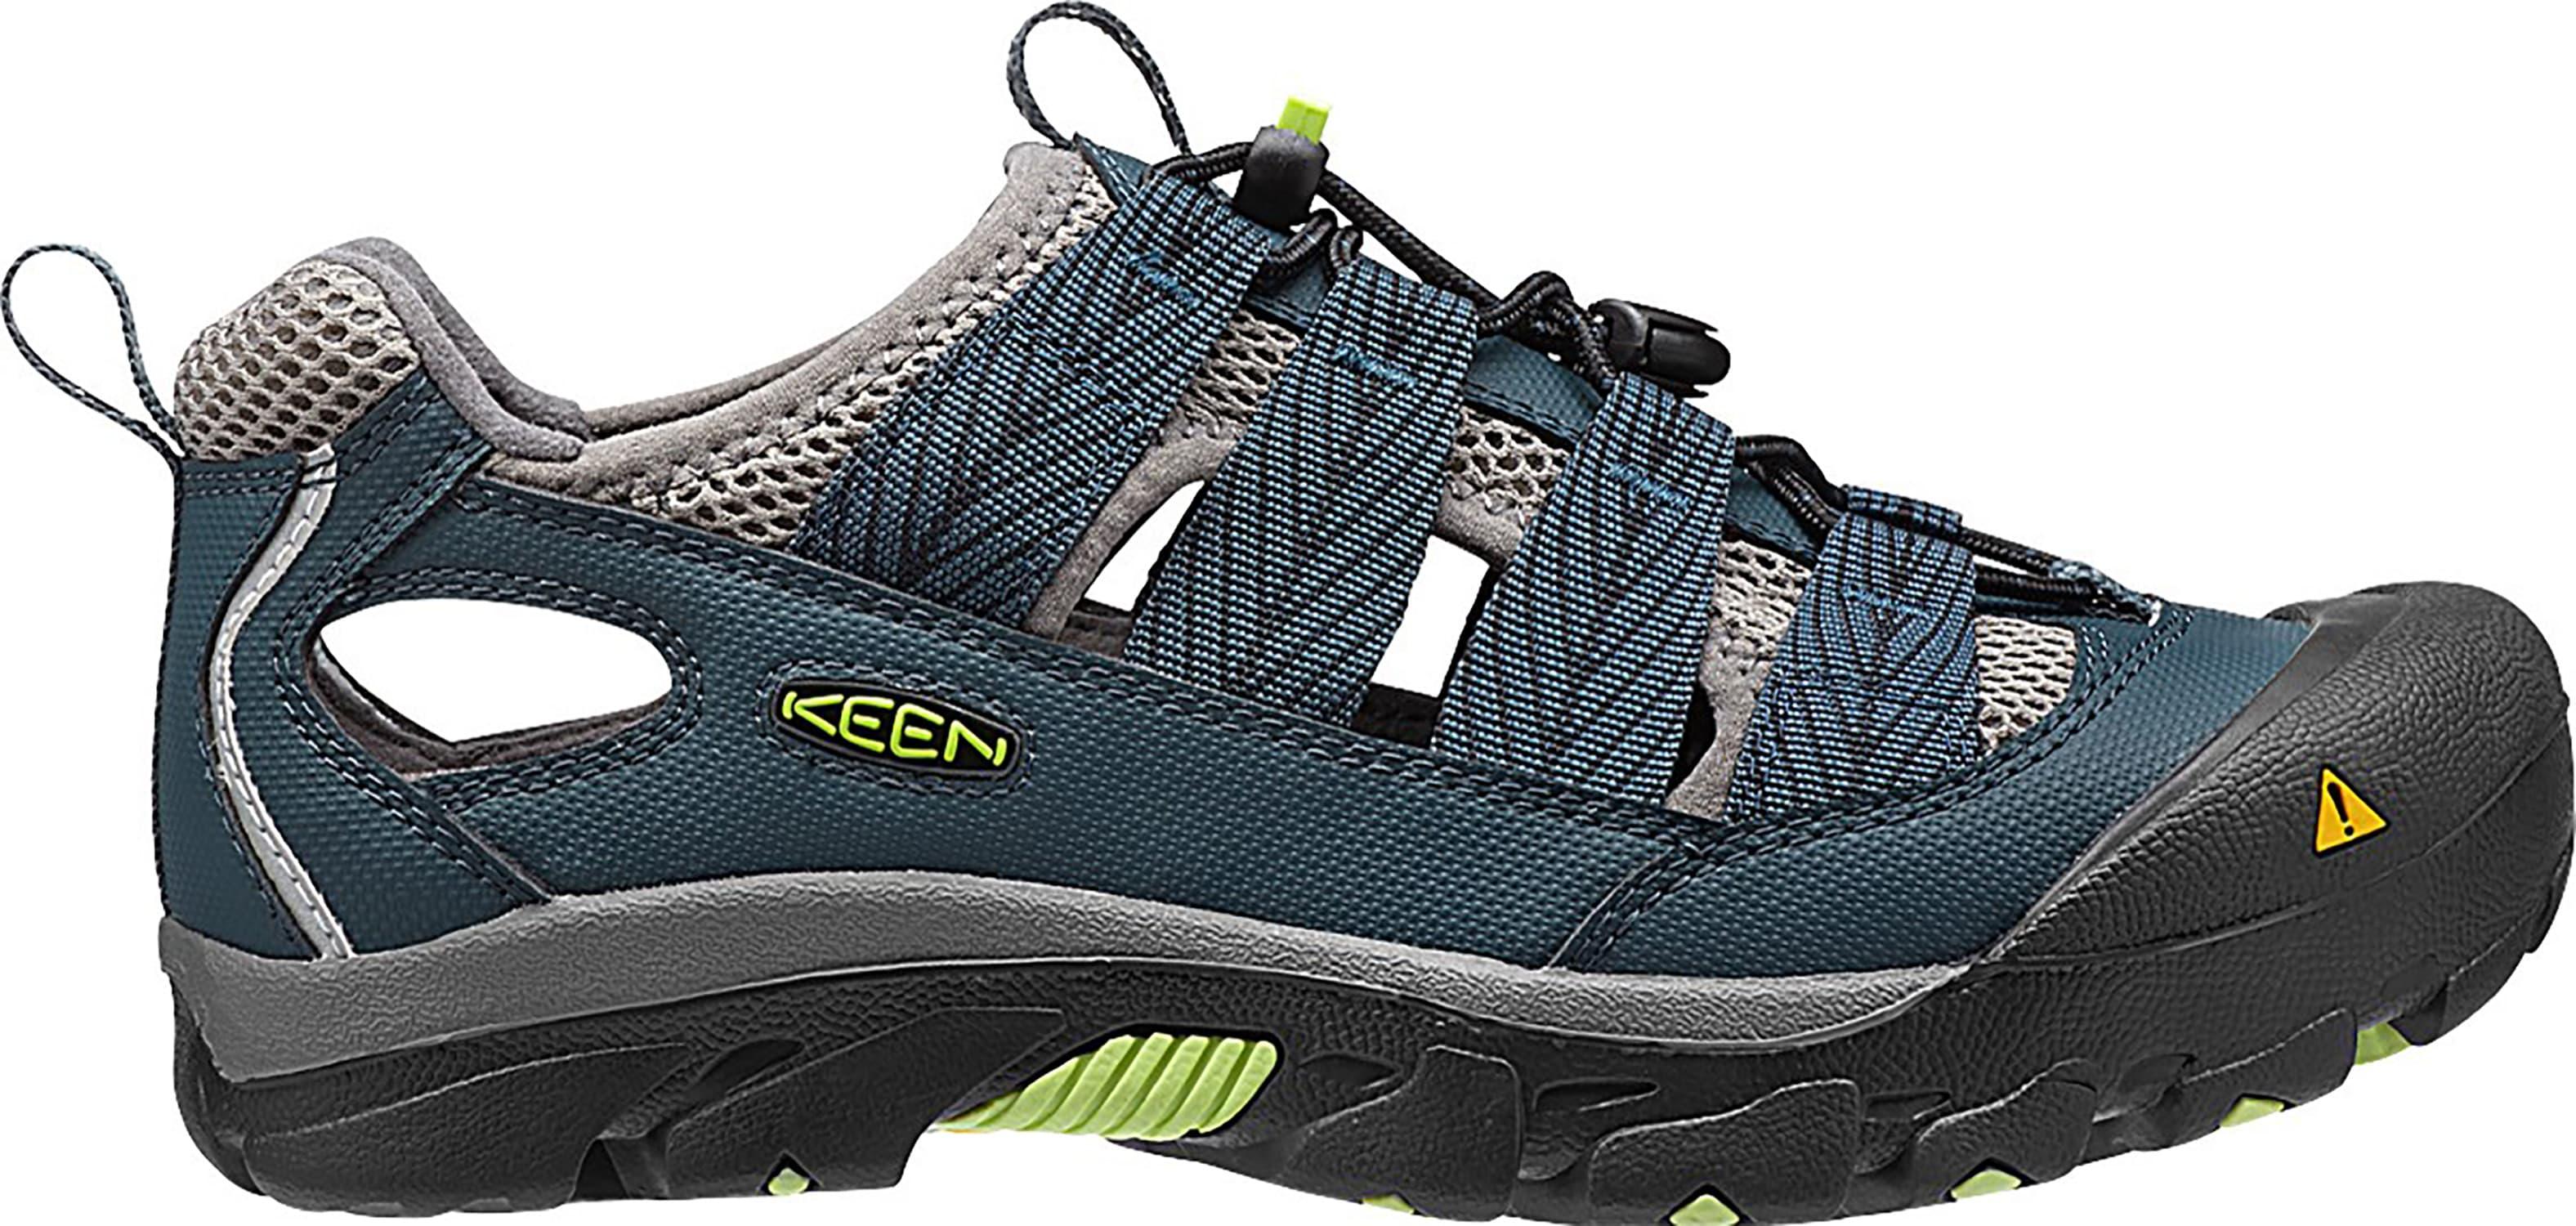 Discount Keen Mens Shoes